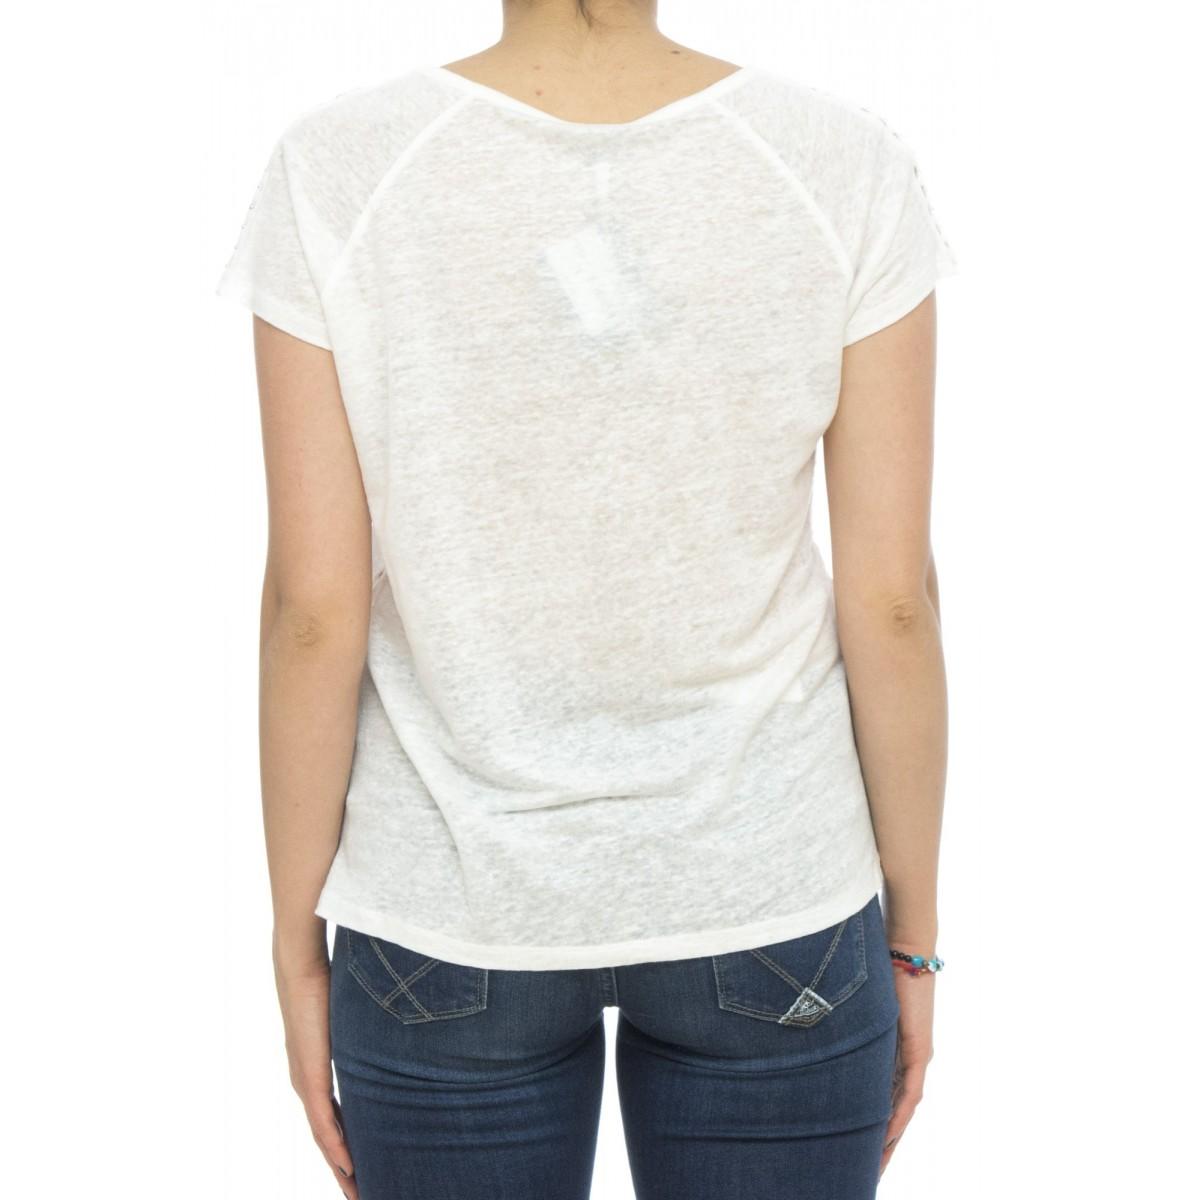 T-shirt - Besia t-shirt